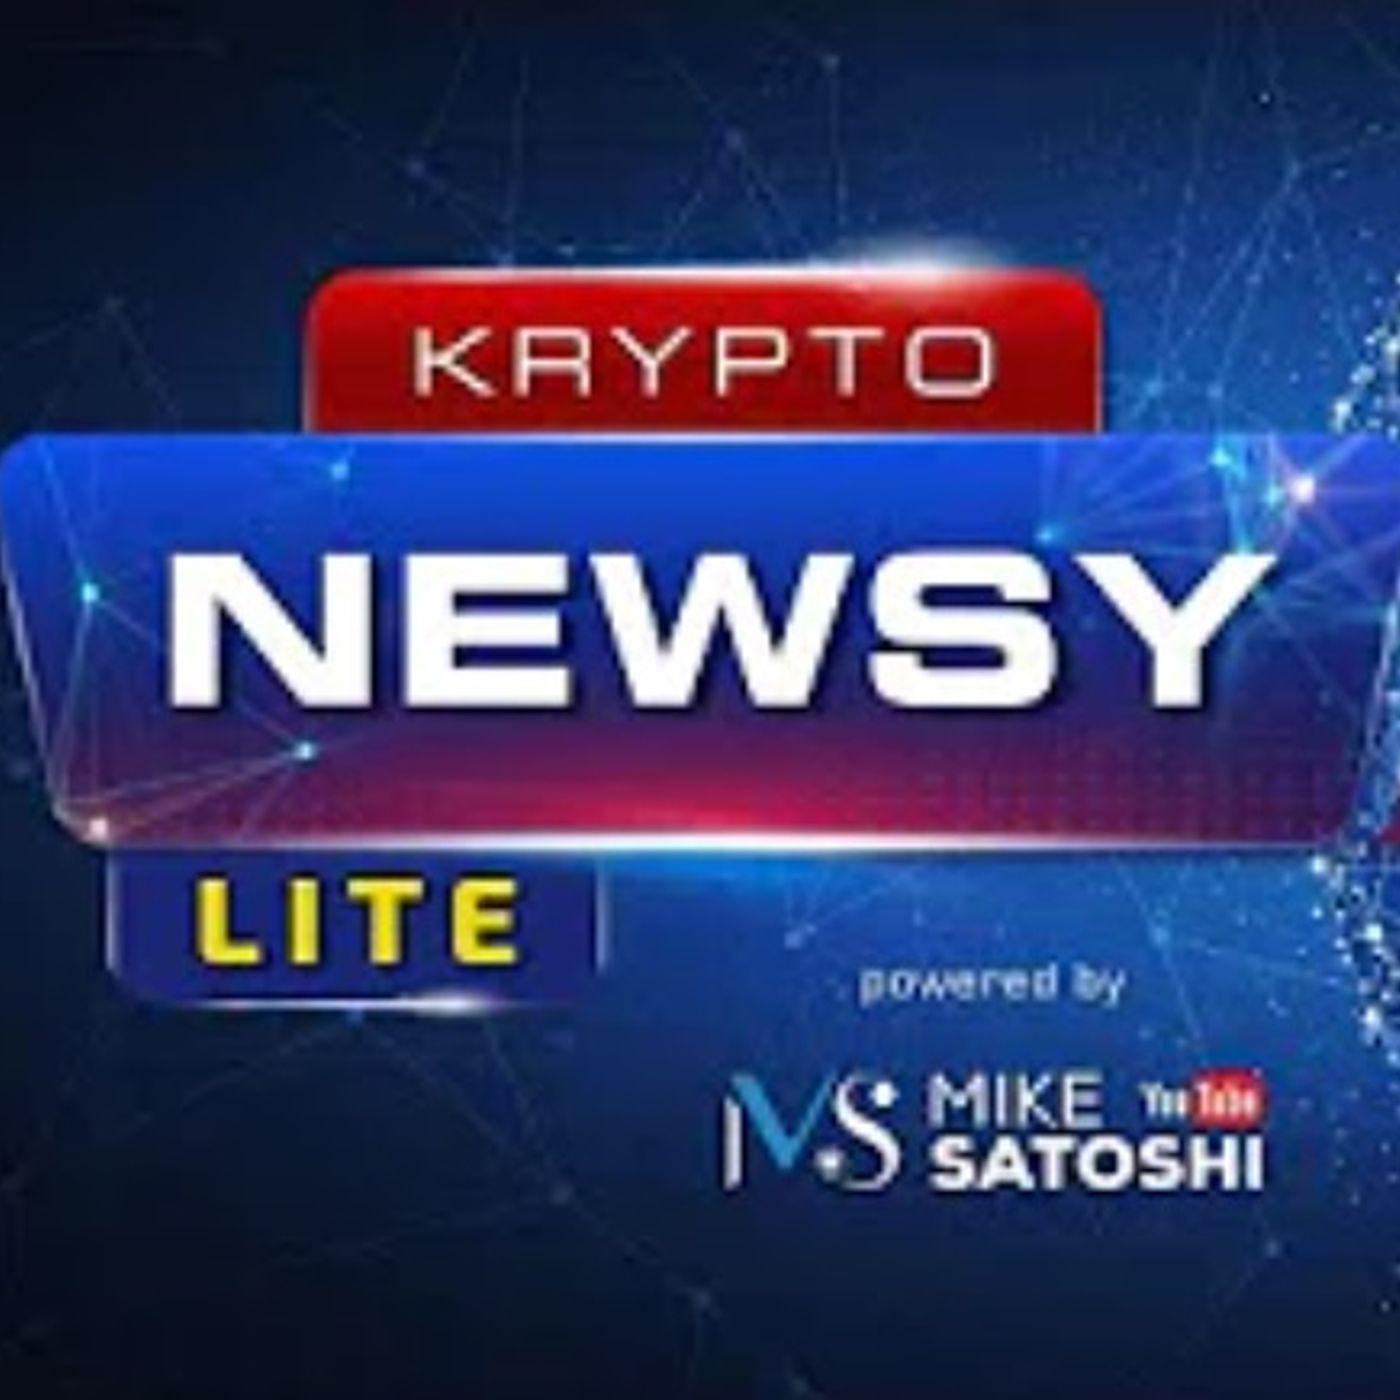 Krypto Newsy Lite #1 | 12.05.2020 | JP Morgan Chase otwiera konta Coinbase i Gemini, COVID-19 napędzi rynek, Smart kontrakty XRP Ledger